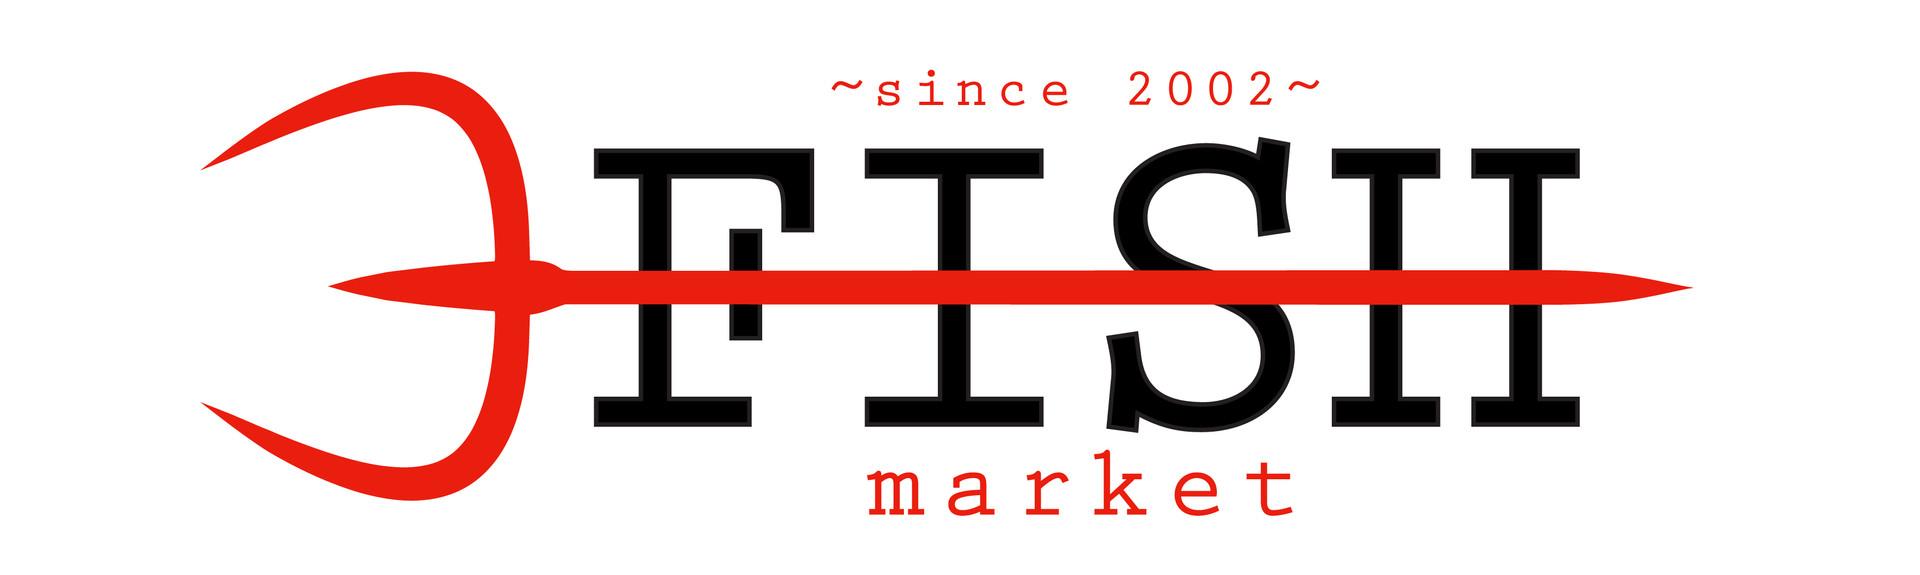 3fish a4-333.jpg